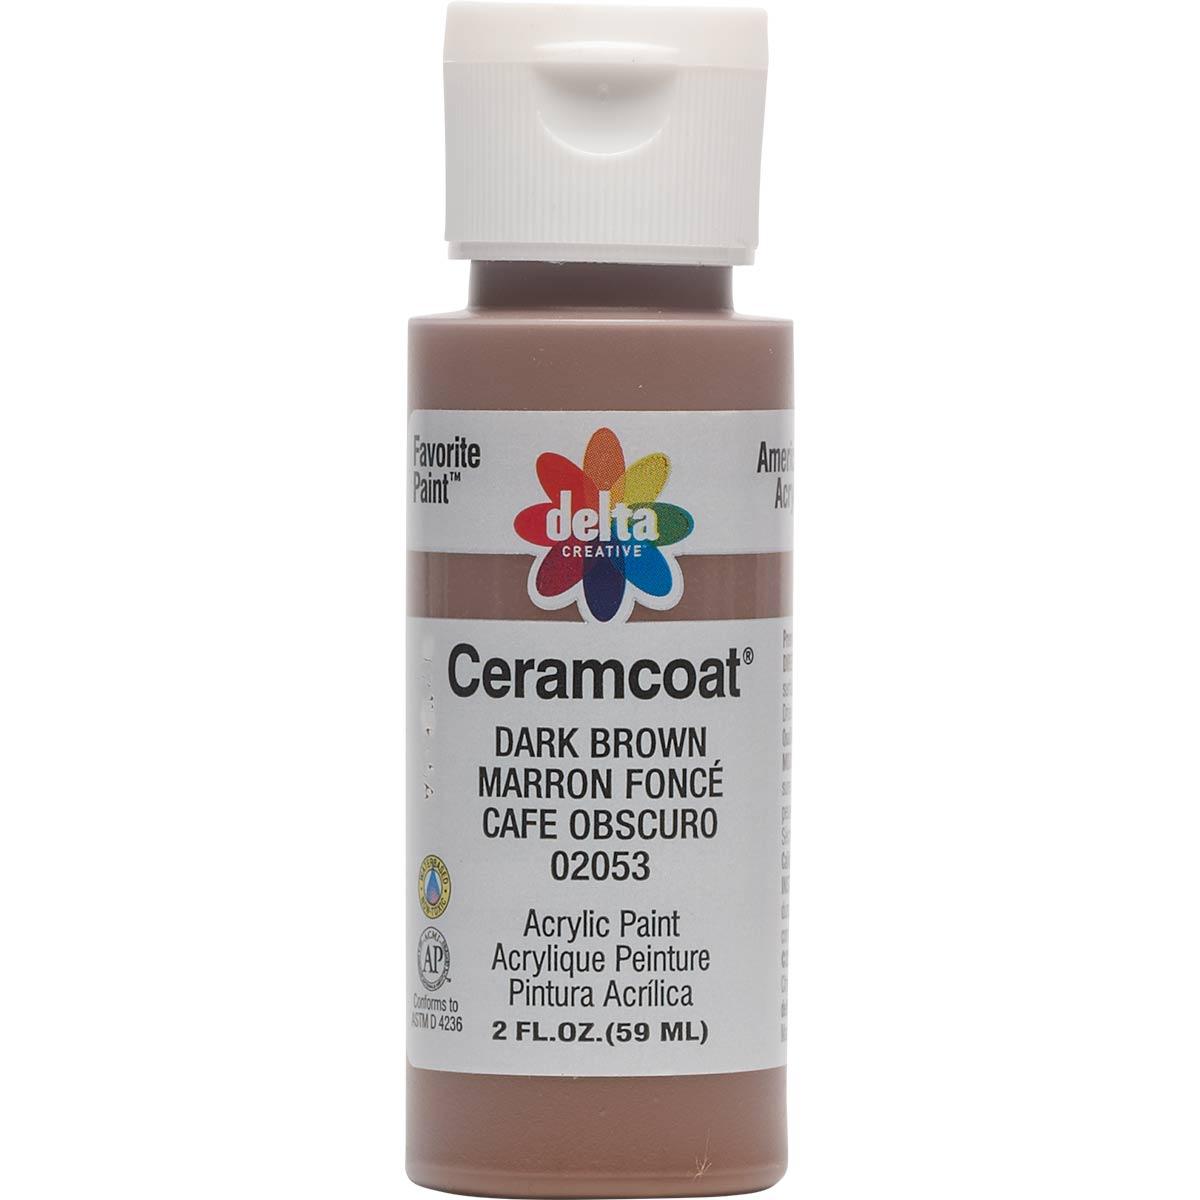 Delta Ceramcoat ® Acrylic Paint - Dark Brown, 2 oz. - 020530202W